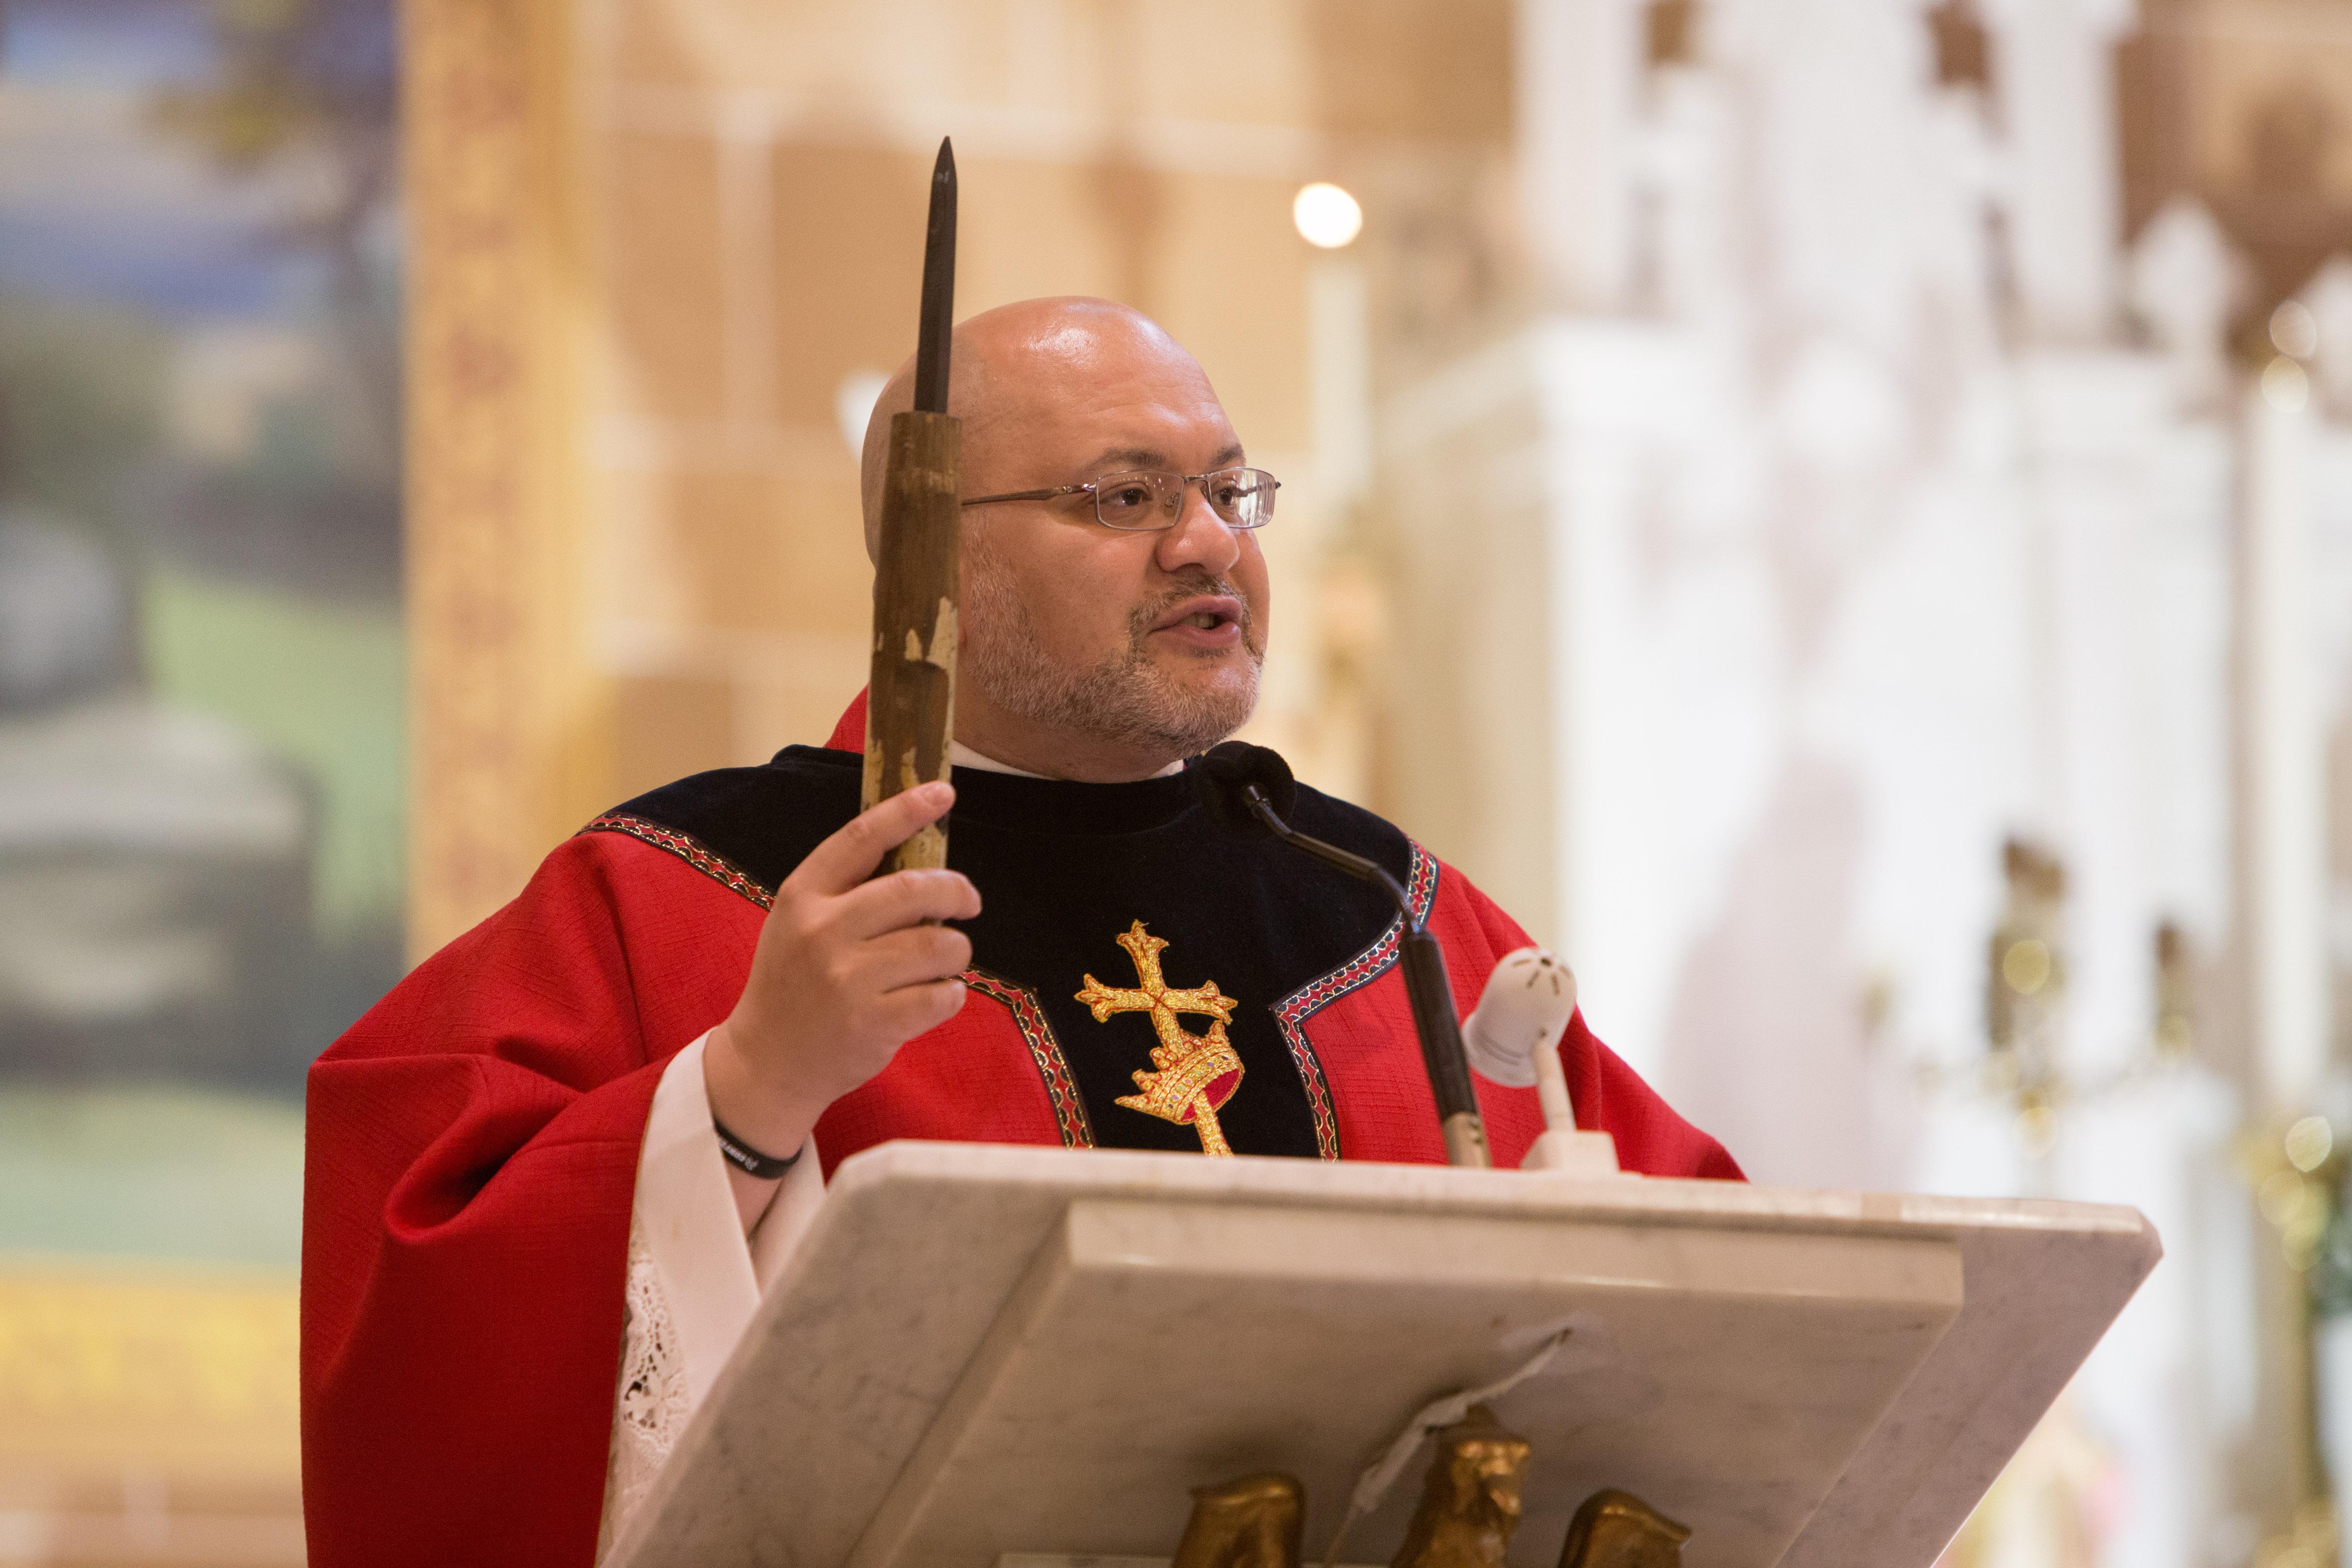 10/07/2015 - St Maria Goretti08